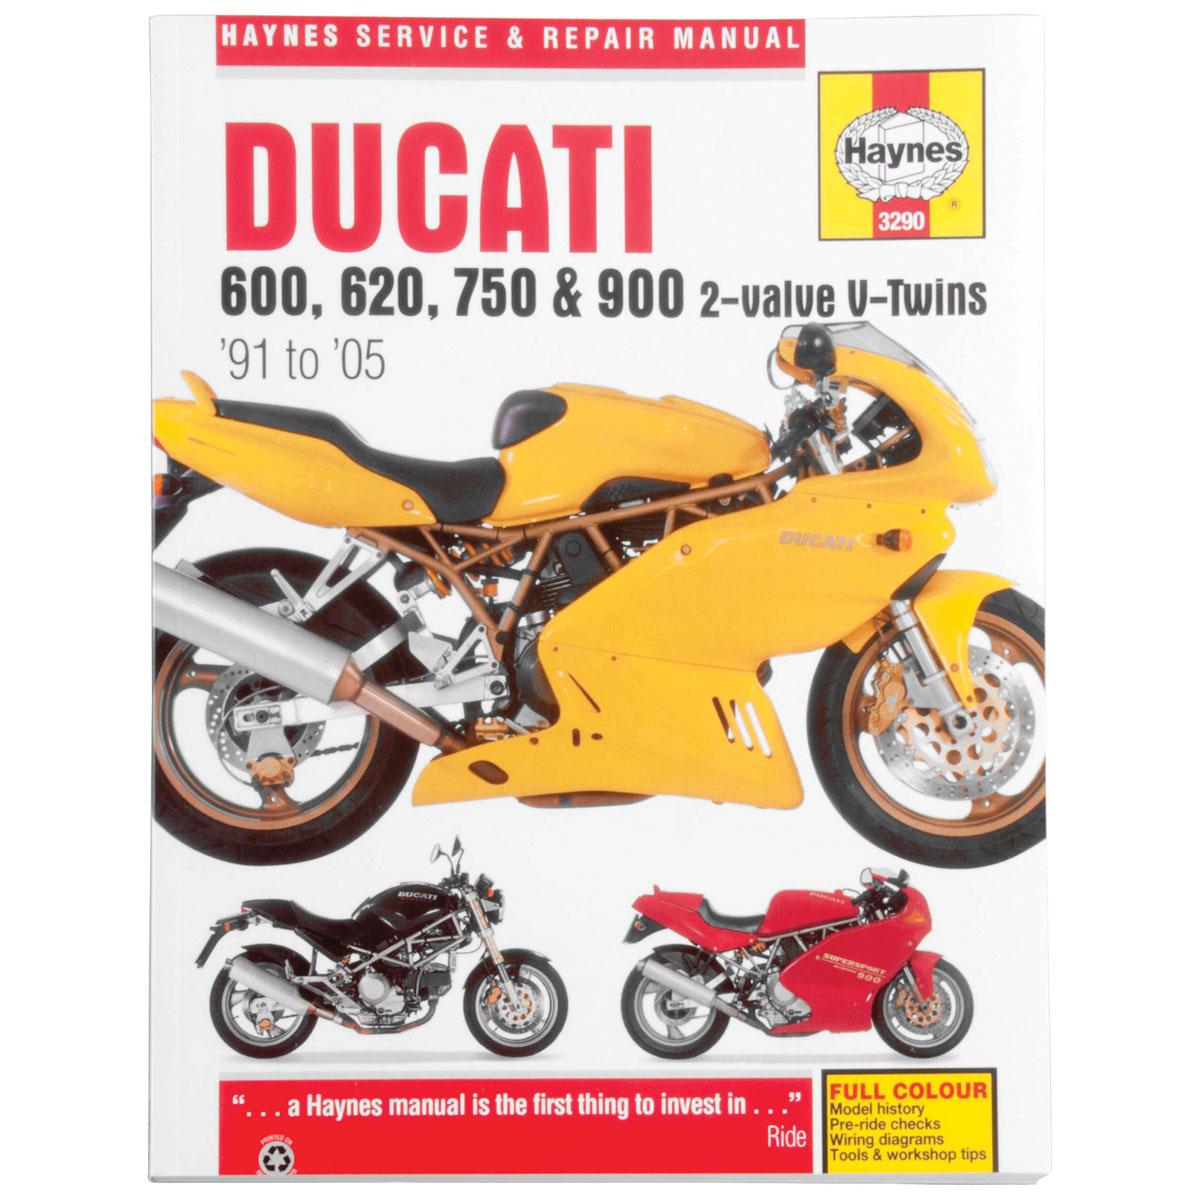 hight resolution of ducati 900ss wiring diagram workshop manual wiring diagram a6 ducati monster 900 wiring diagram ducati monster 900 wiring